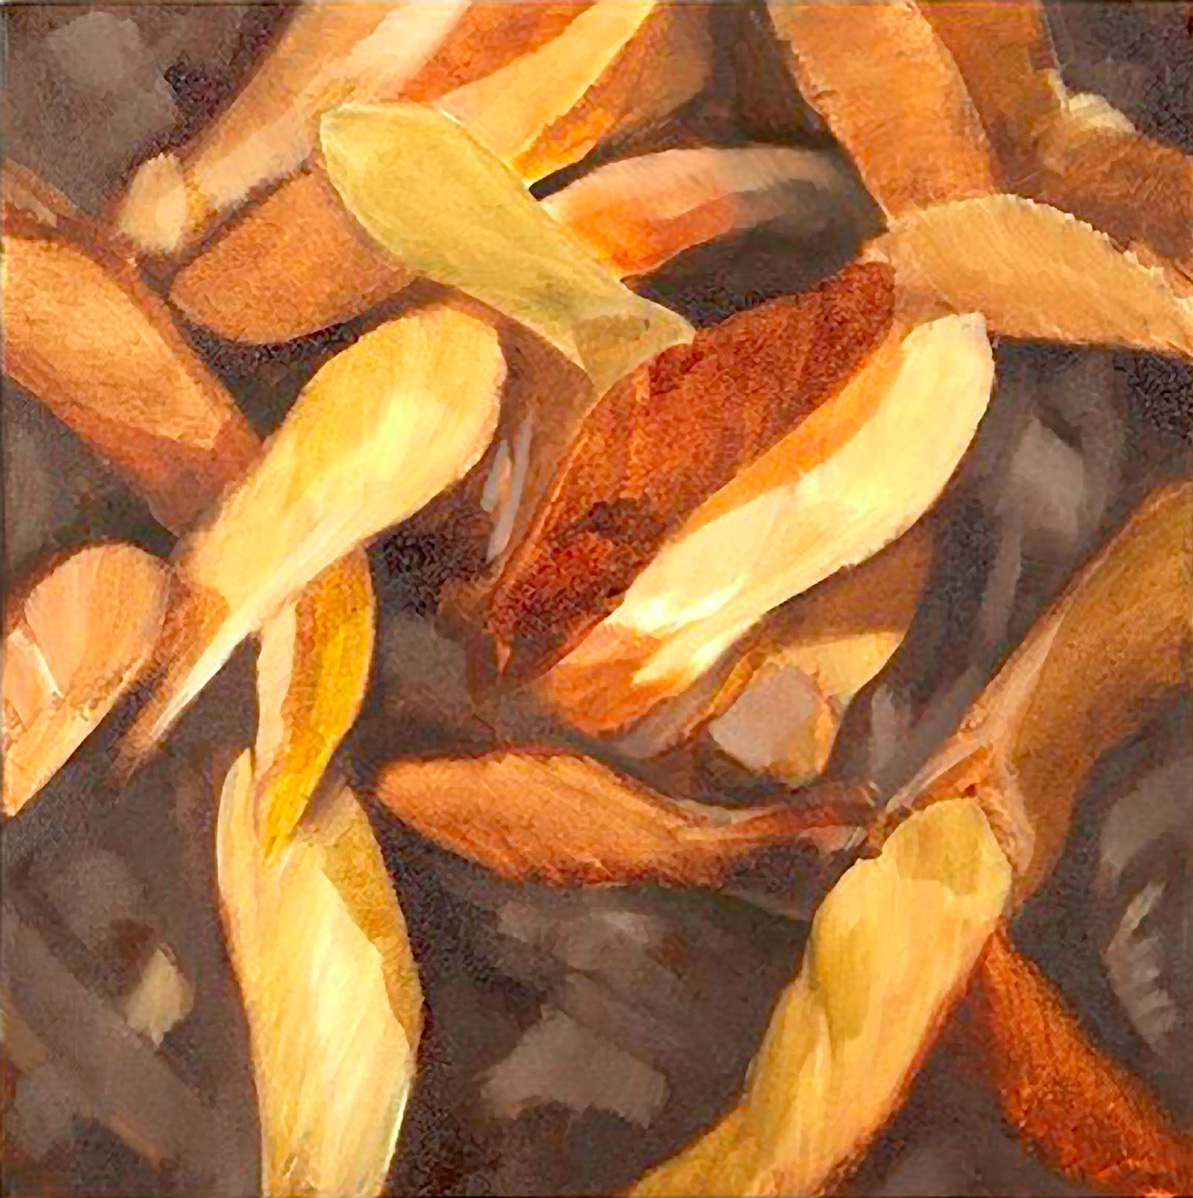 SYCAMORE SEEDS Oil on canvas, 35cm x 35cm